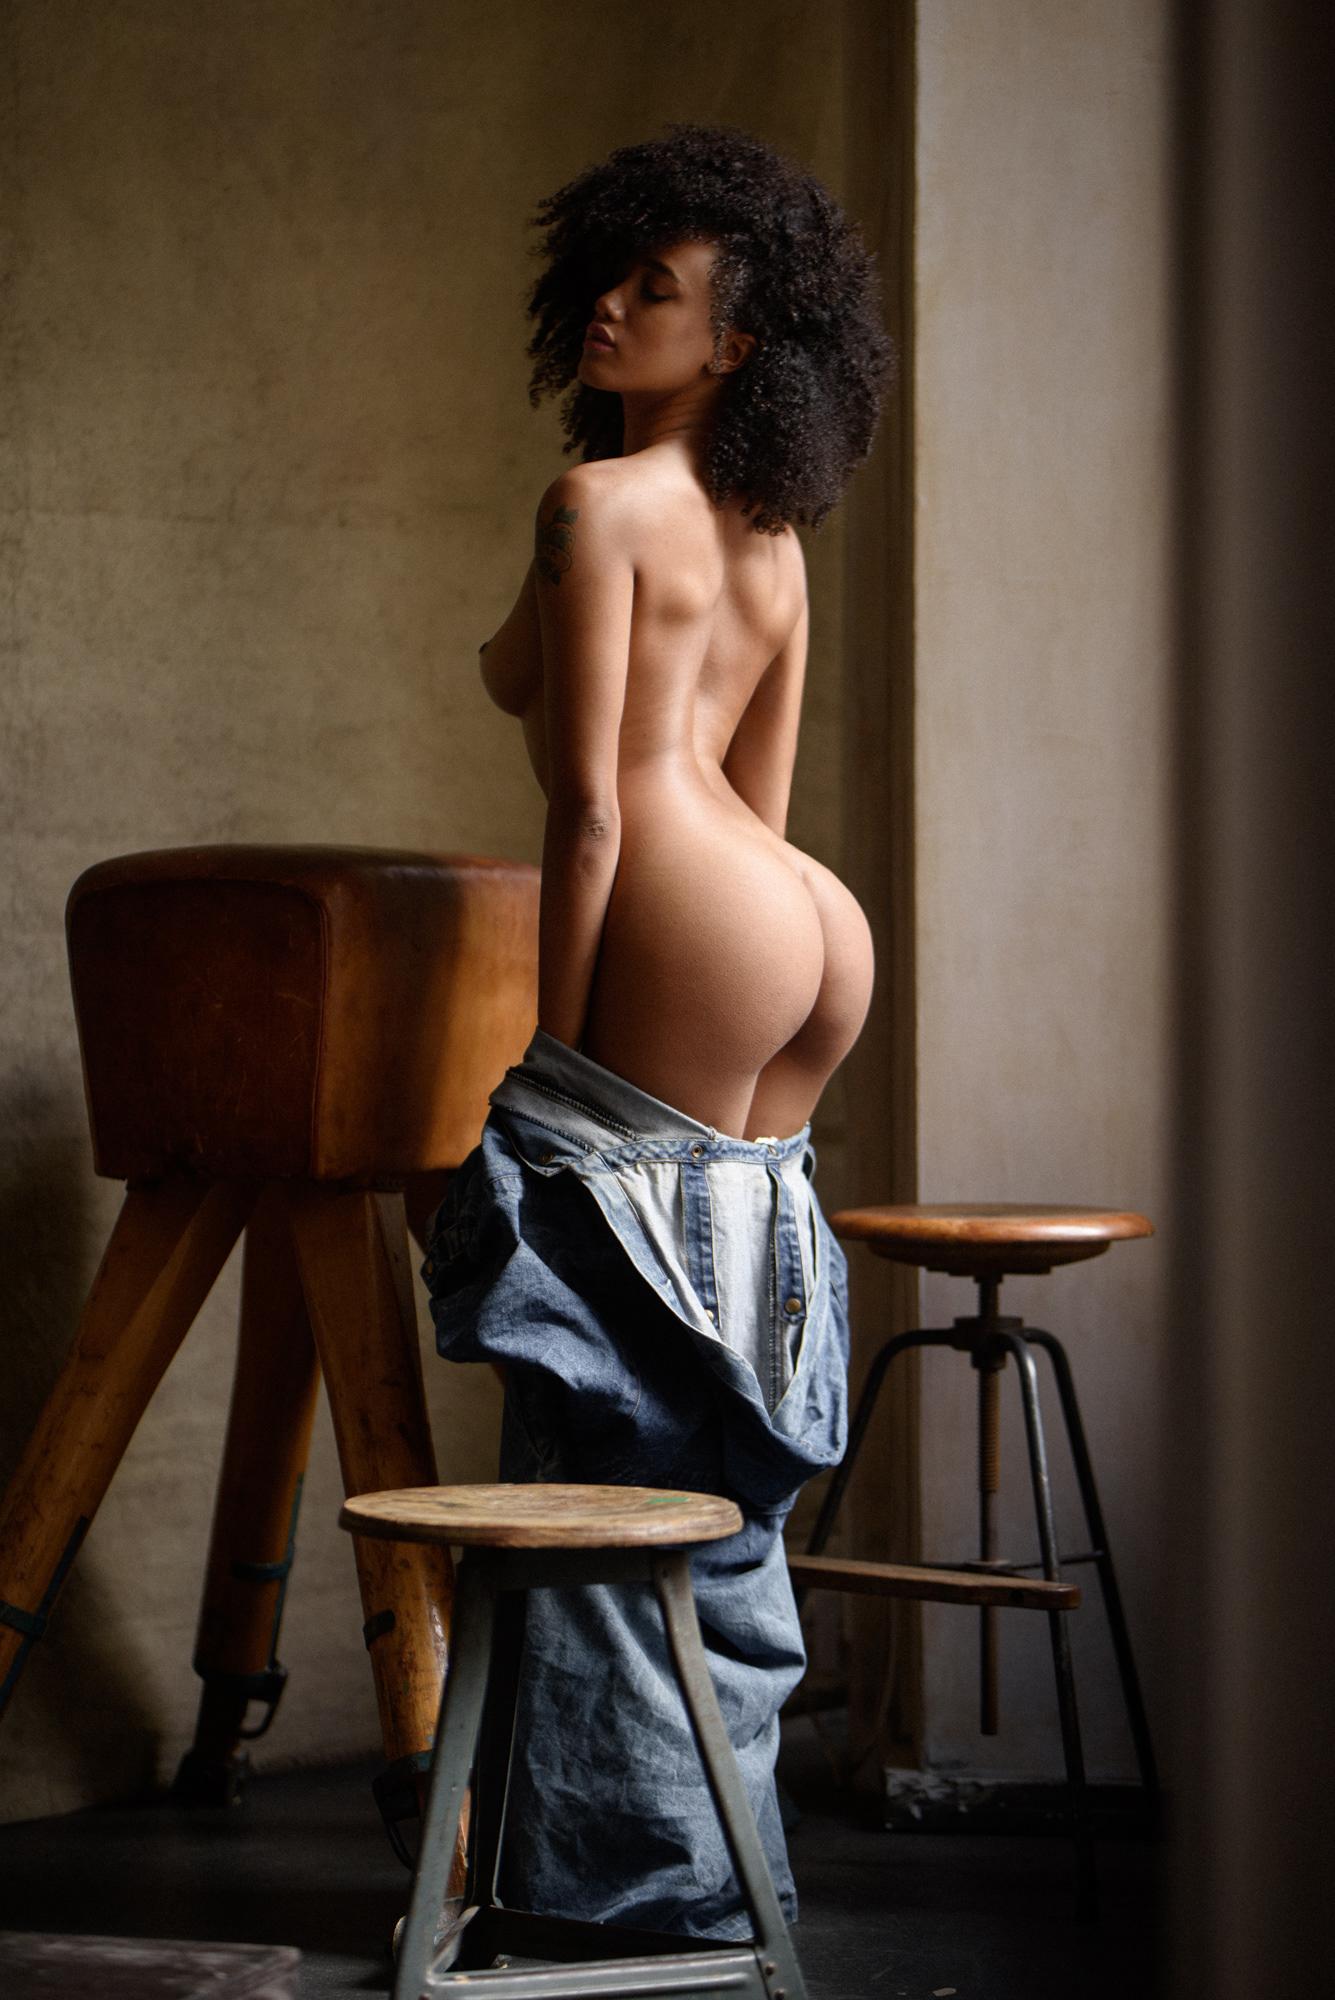 Beauty set free / фотограф Sacha Leyendecker